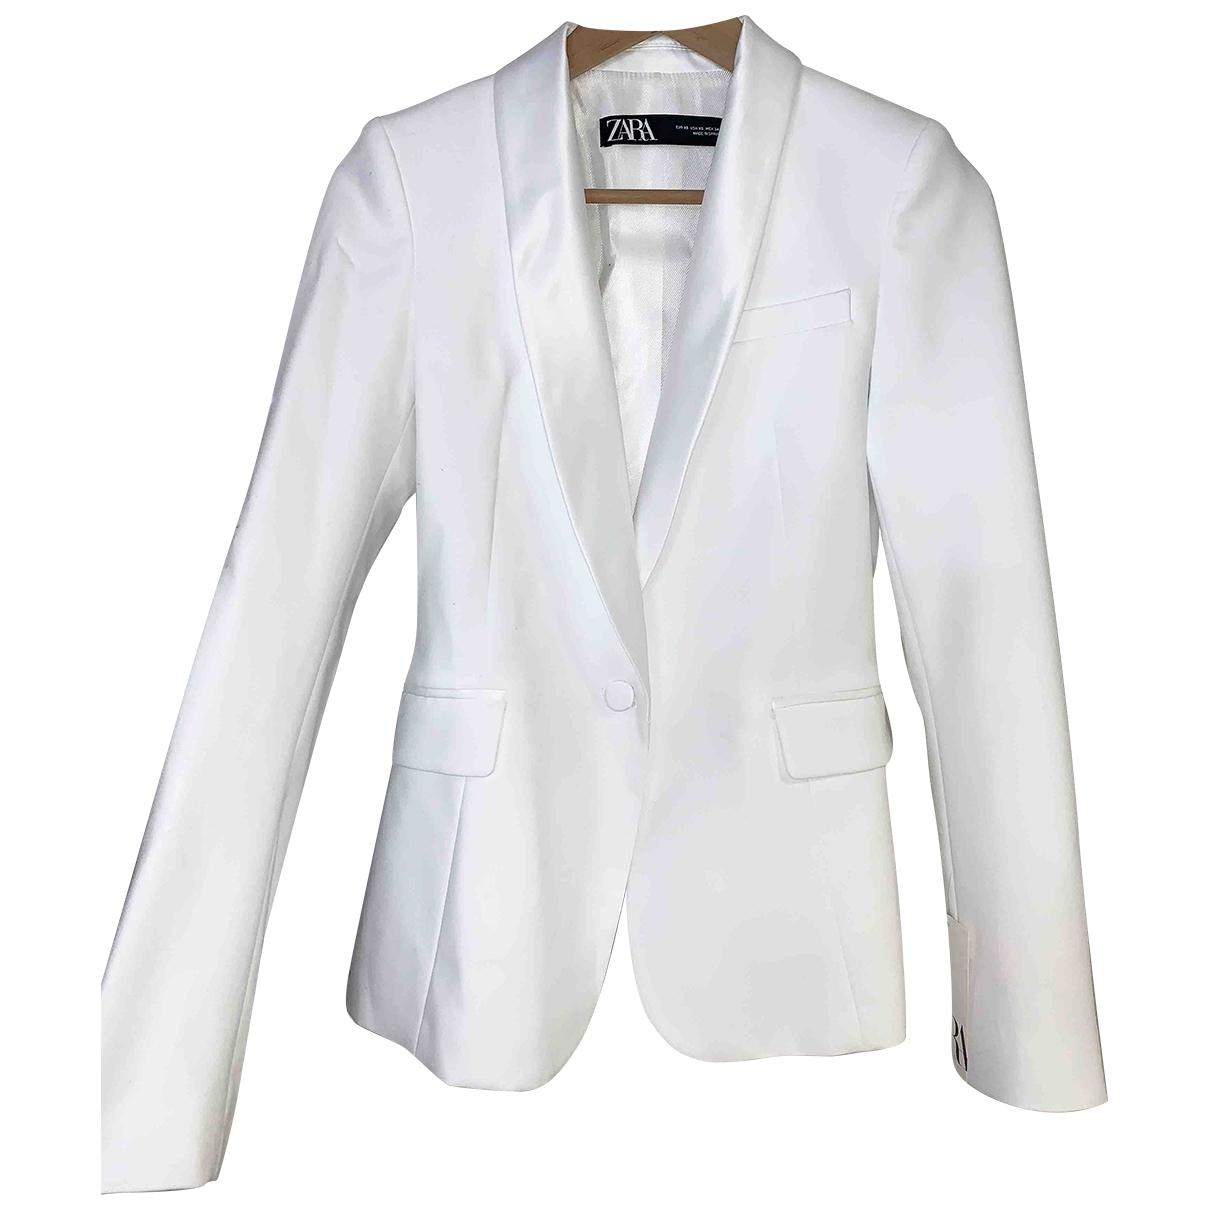 Zara \N White jacket for Women XS International